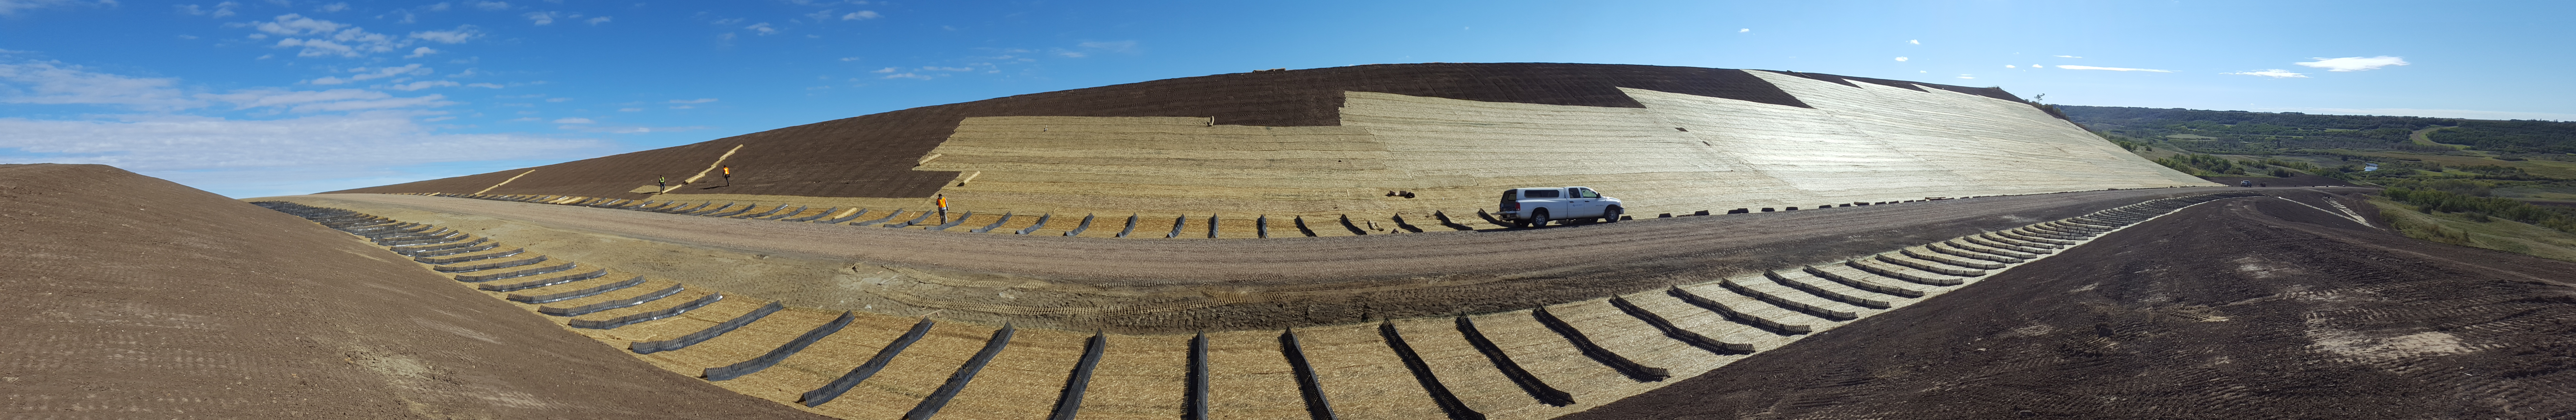 Erosion Control, Hydroseeding   Edmonton, Alberta   Give Back